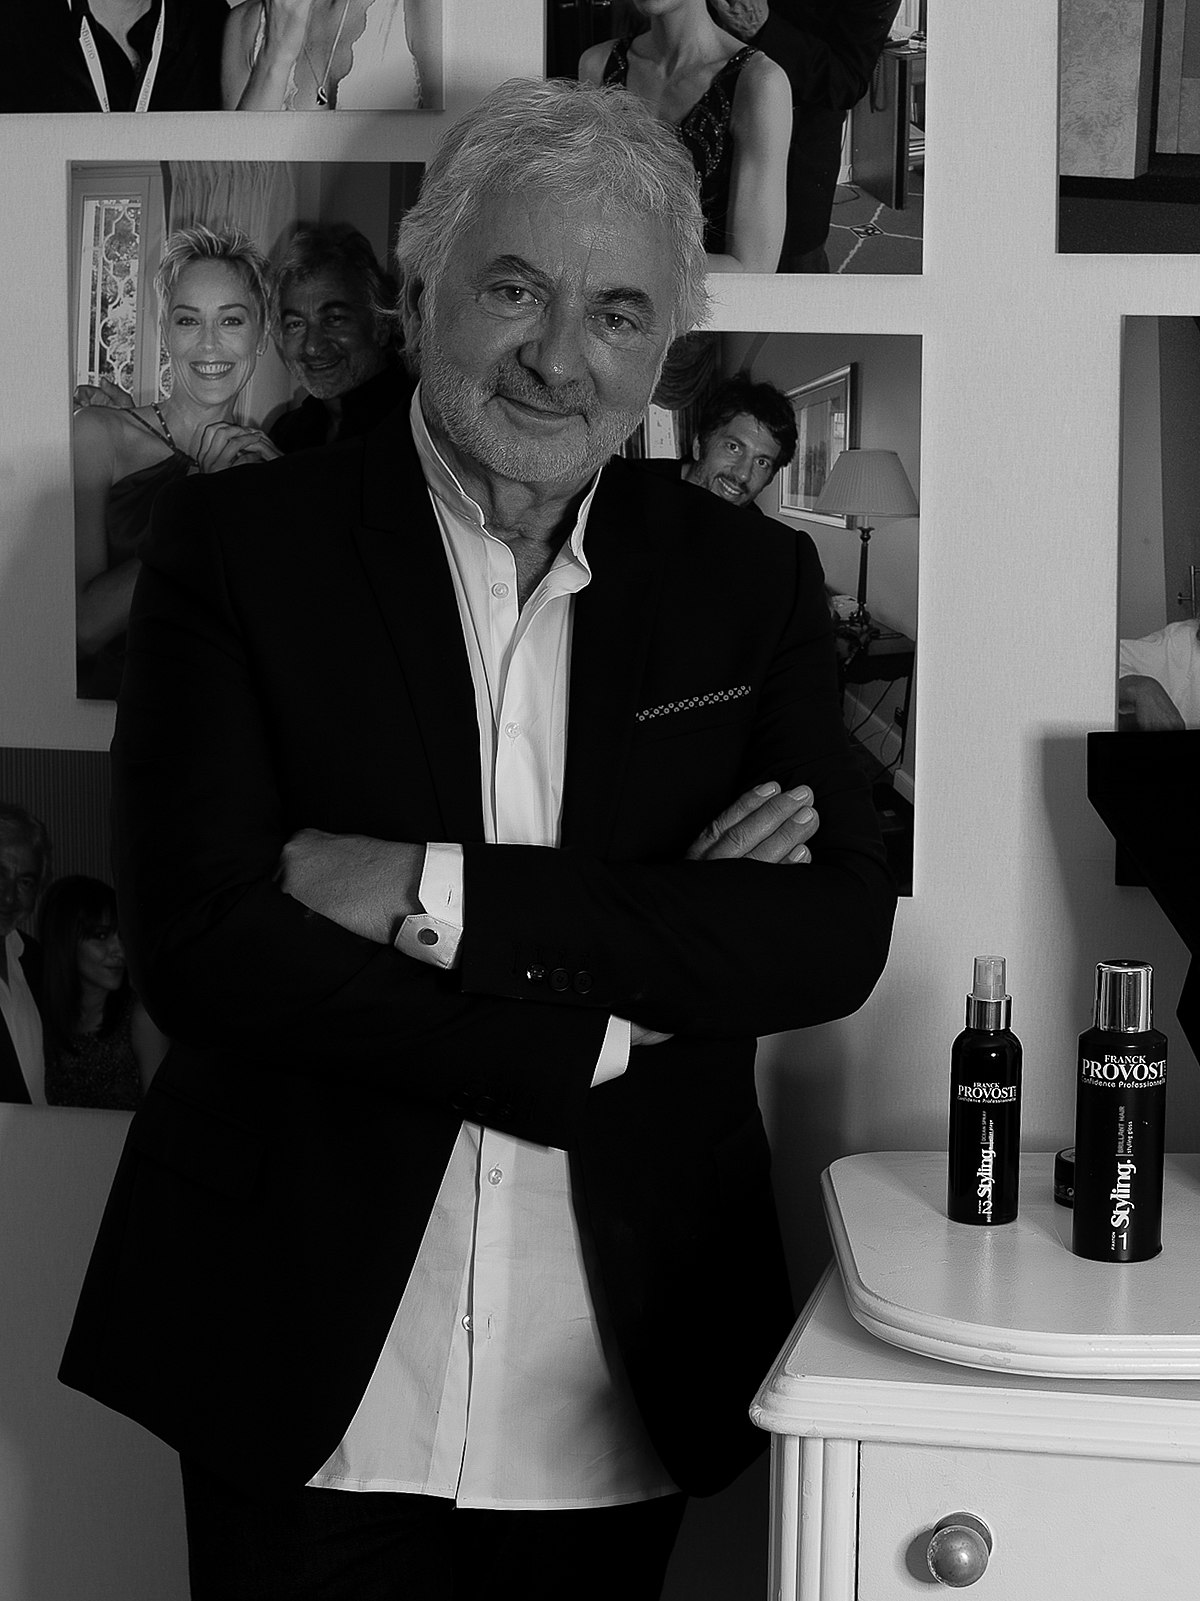 Franck provost wikip dia - Salon de coiffure franck provost tarifs ...